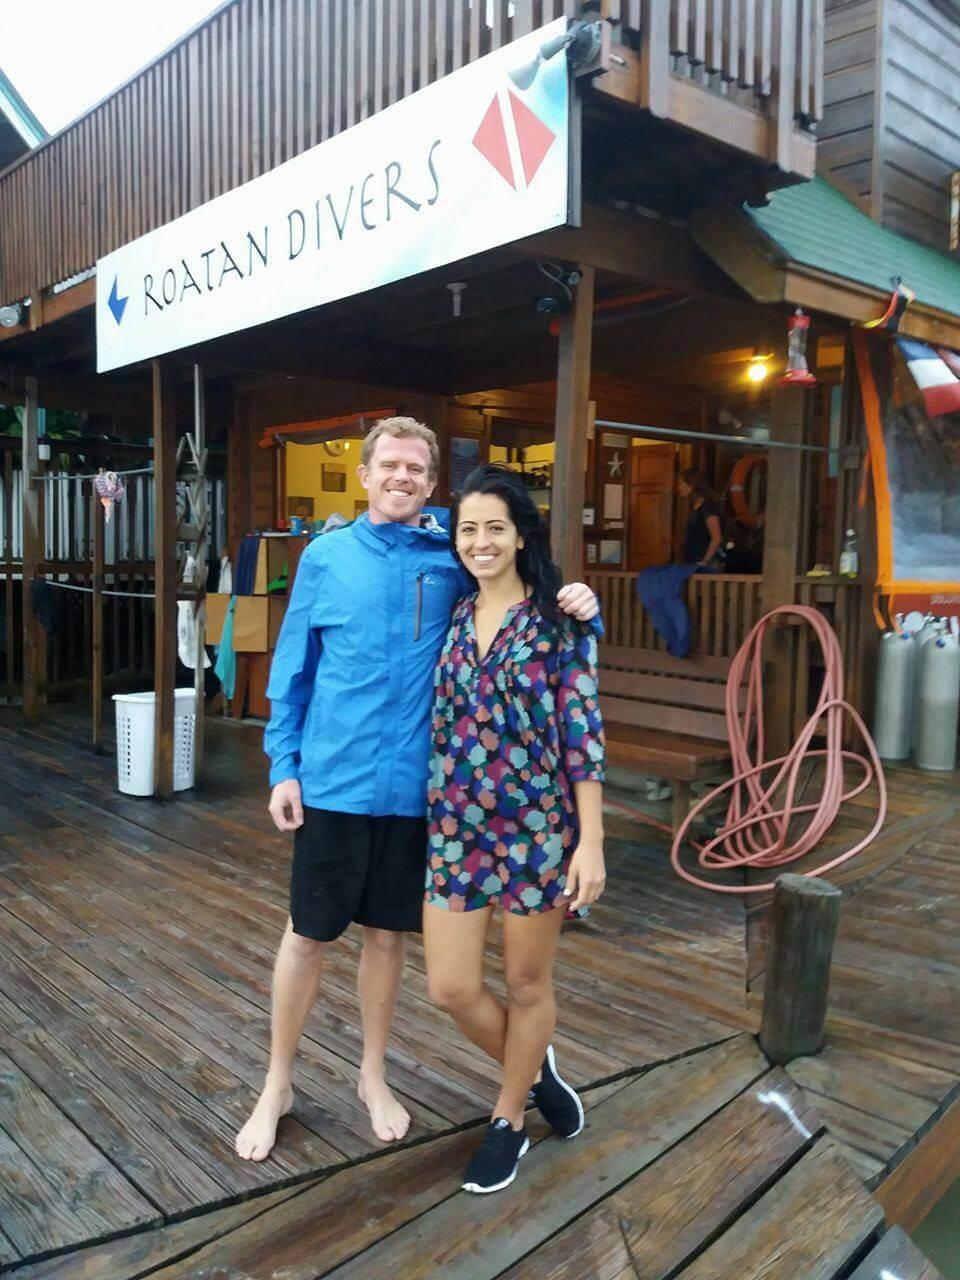 Open Water Diver Course Roatan Divers